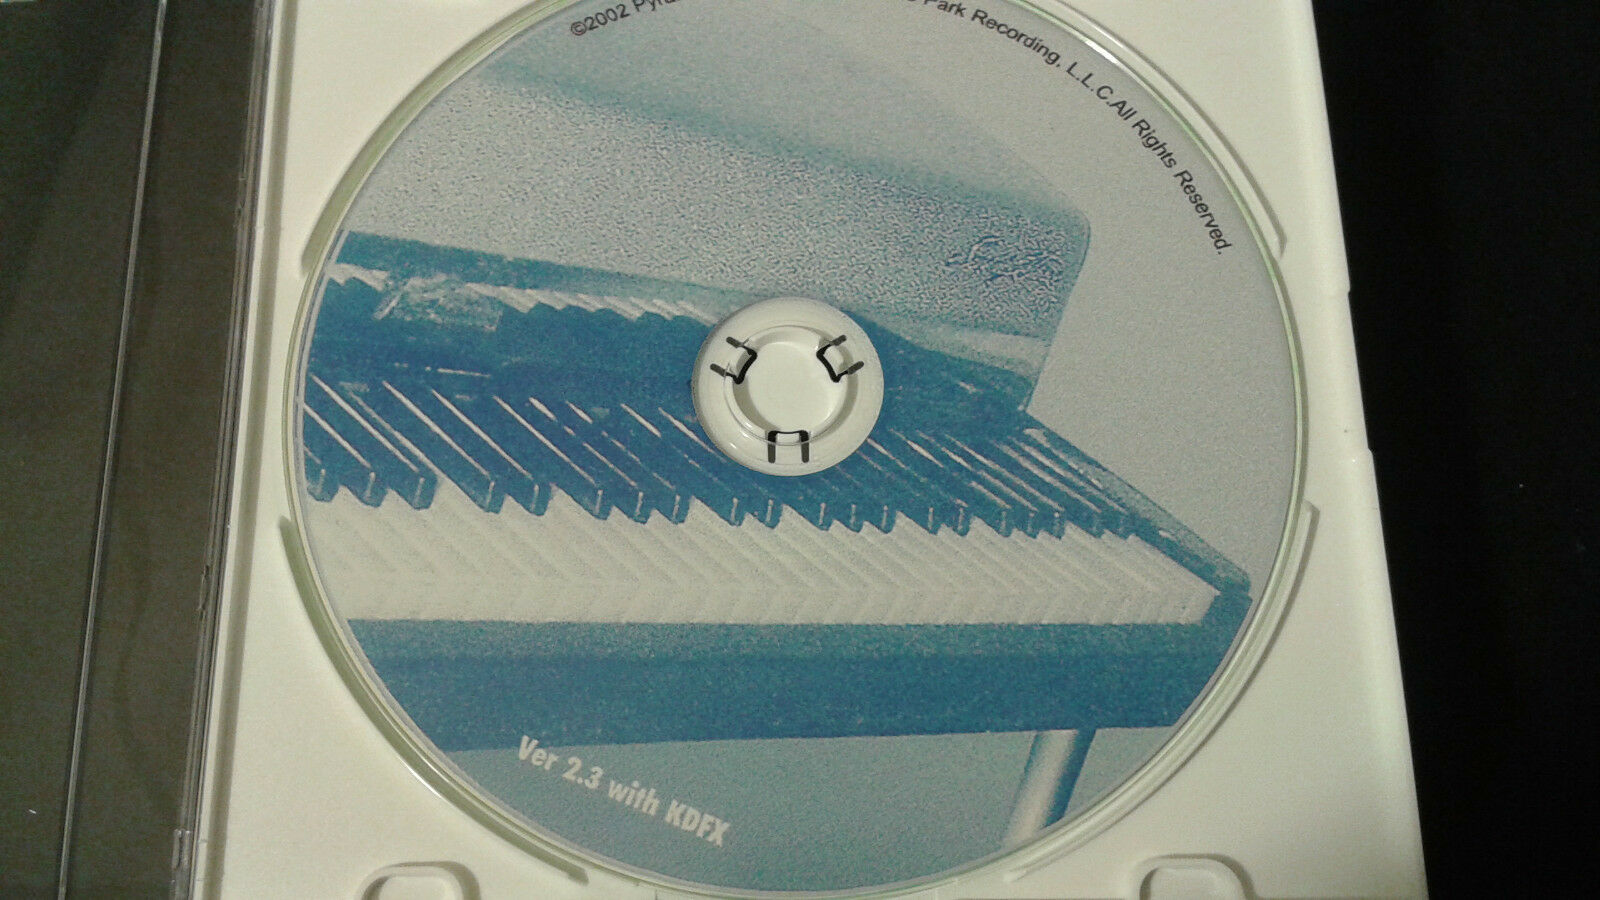 Kurzweil Formatted----  REAL RHODES ver.2.3 w KDFX Cd-Rom+VAST K2500 K2600